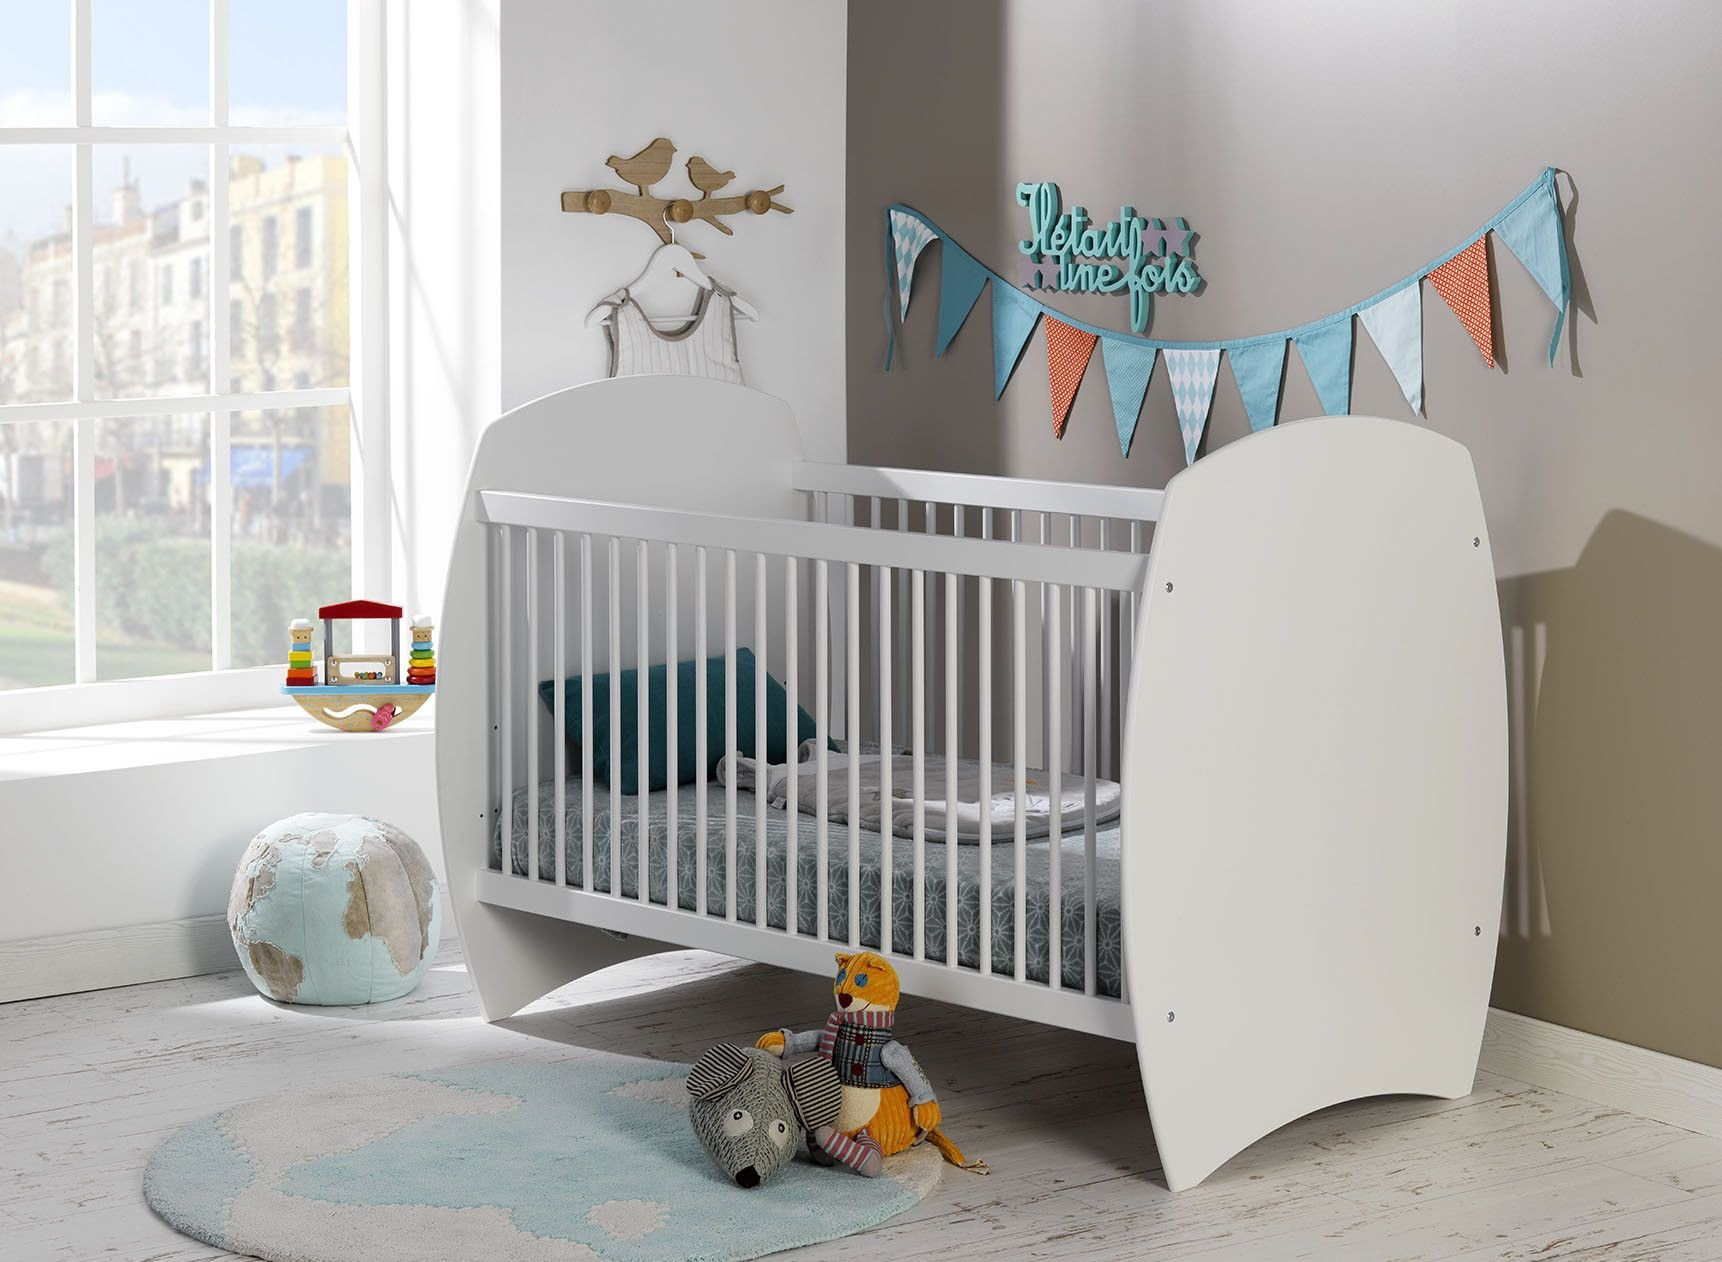 Lit bébé évolutif CALTON Nateo Concept - 1